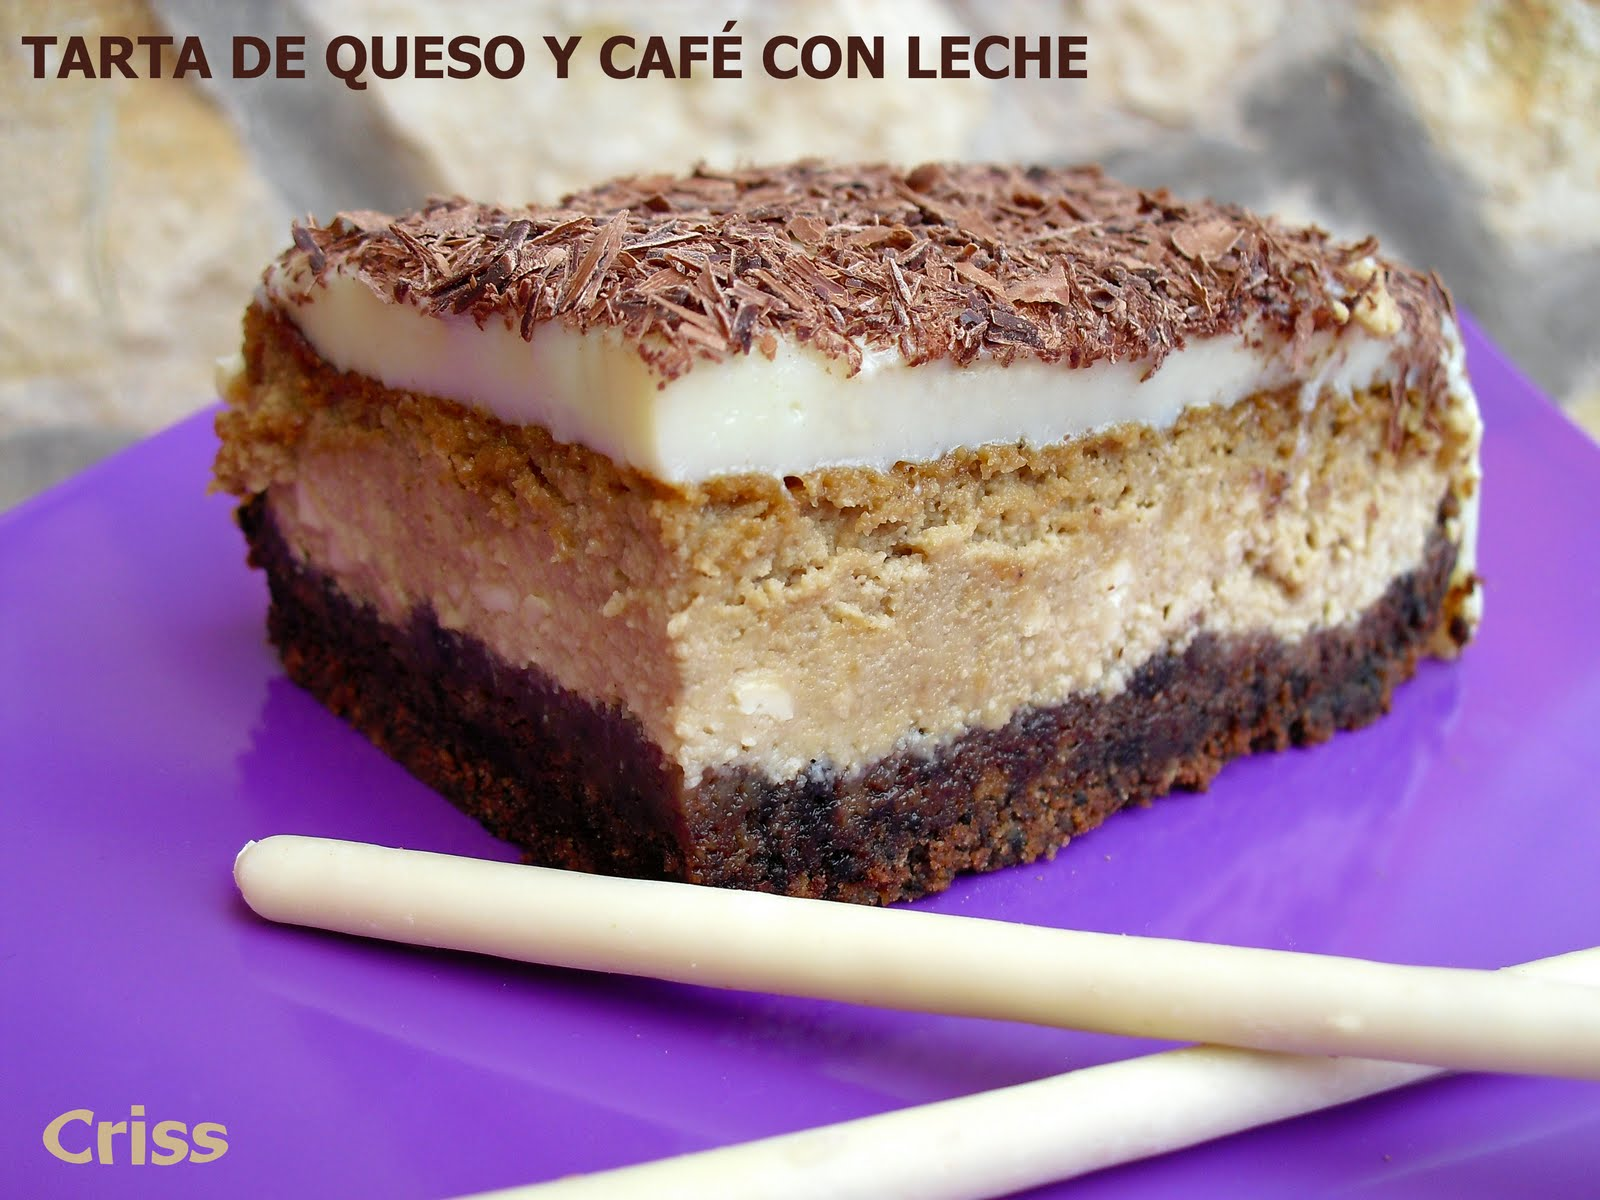 http://1.bp.blogspot.com/_Gl5CdBMHdxQ/TFAtH1THzPI/AAAAAAAAAQE/hPW5tZmV91o/s1600/TARTA+DE+QUESO+Y+CAFÉ+CON+LECHE+(2).jpg